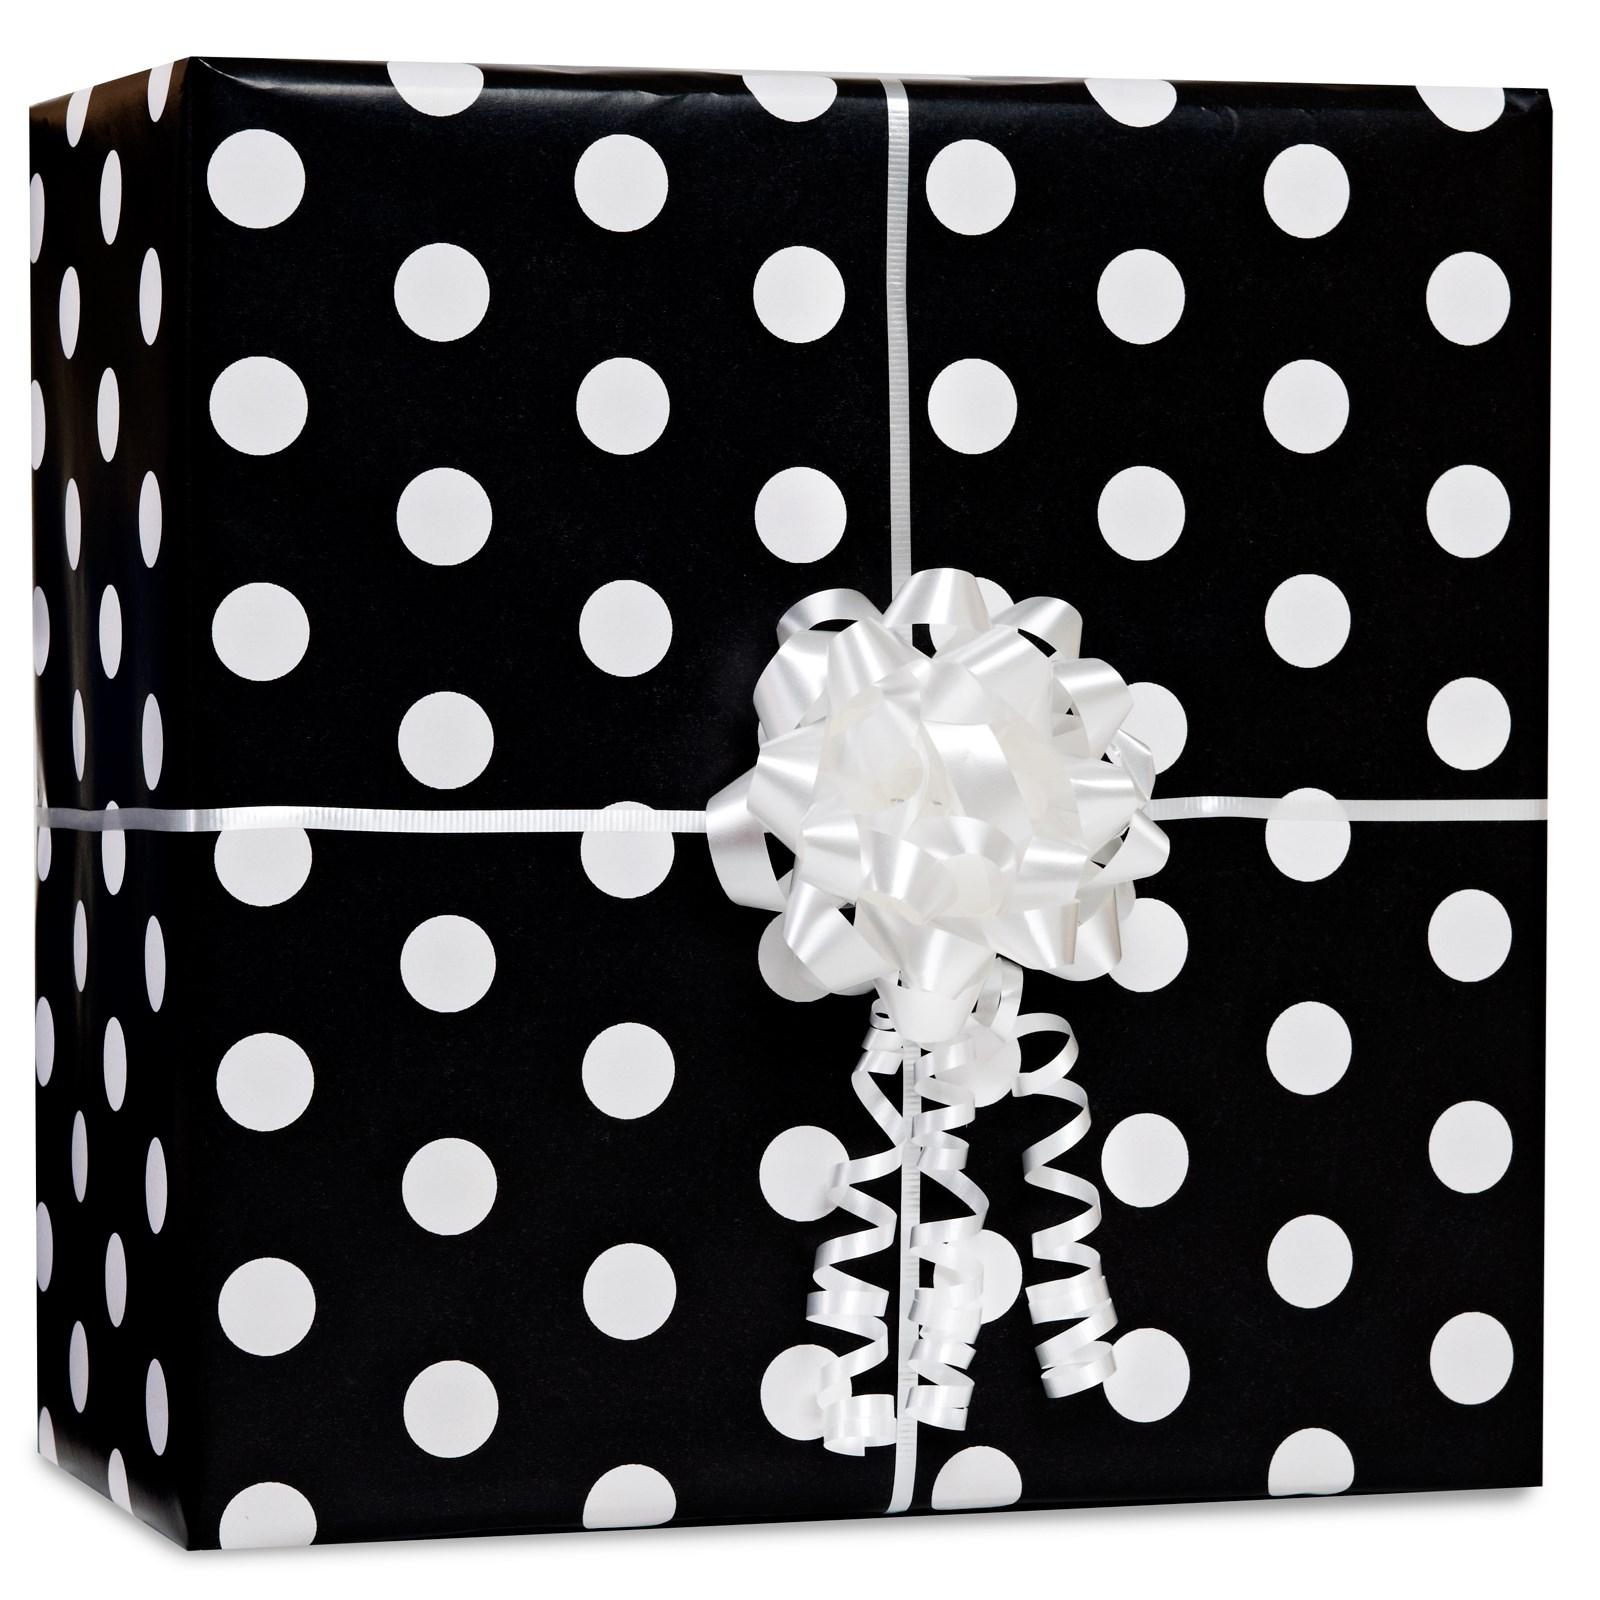 Image of Black Polka Dot Gift Wrap Kit